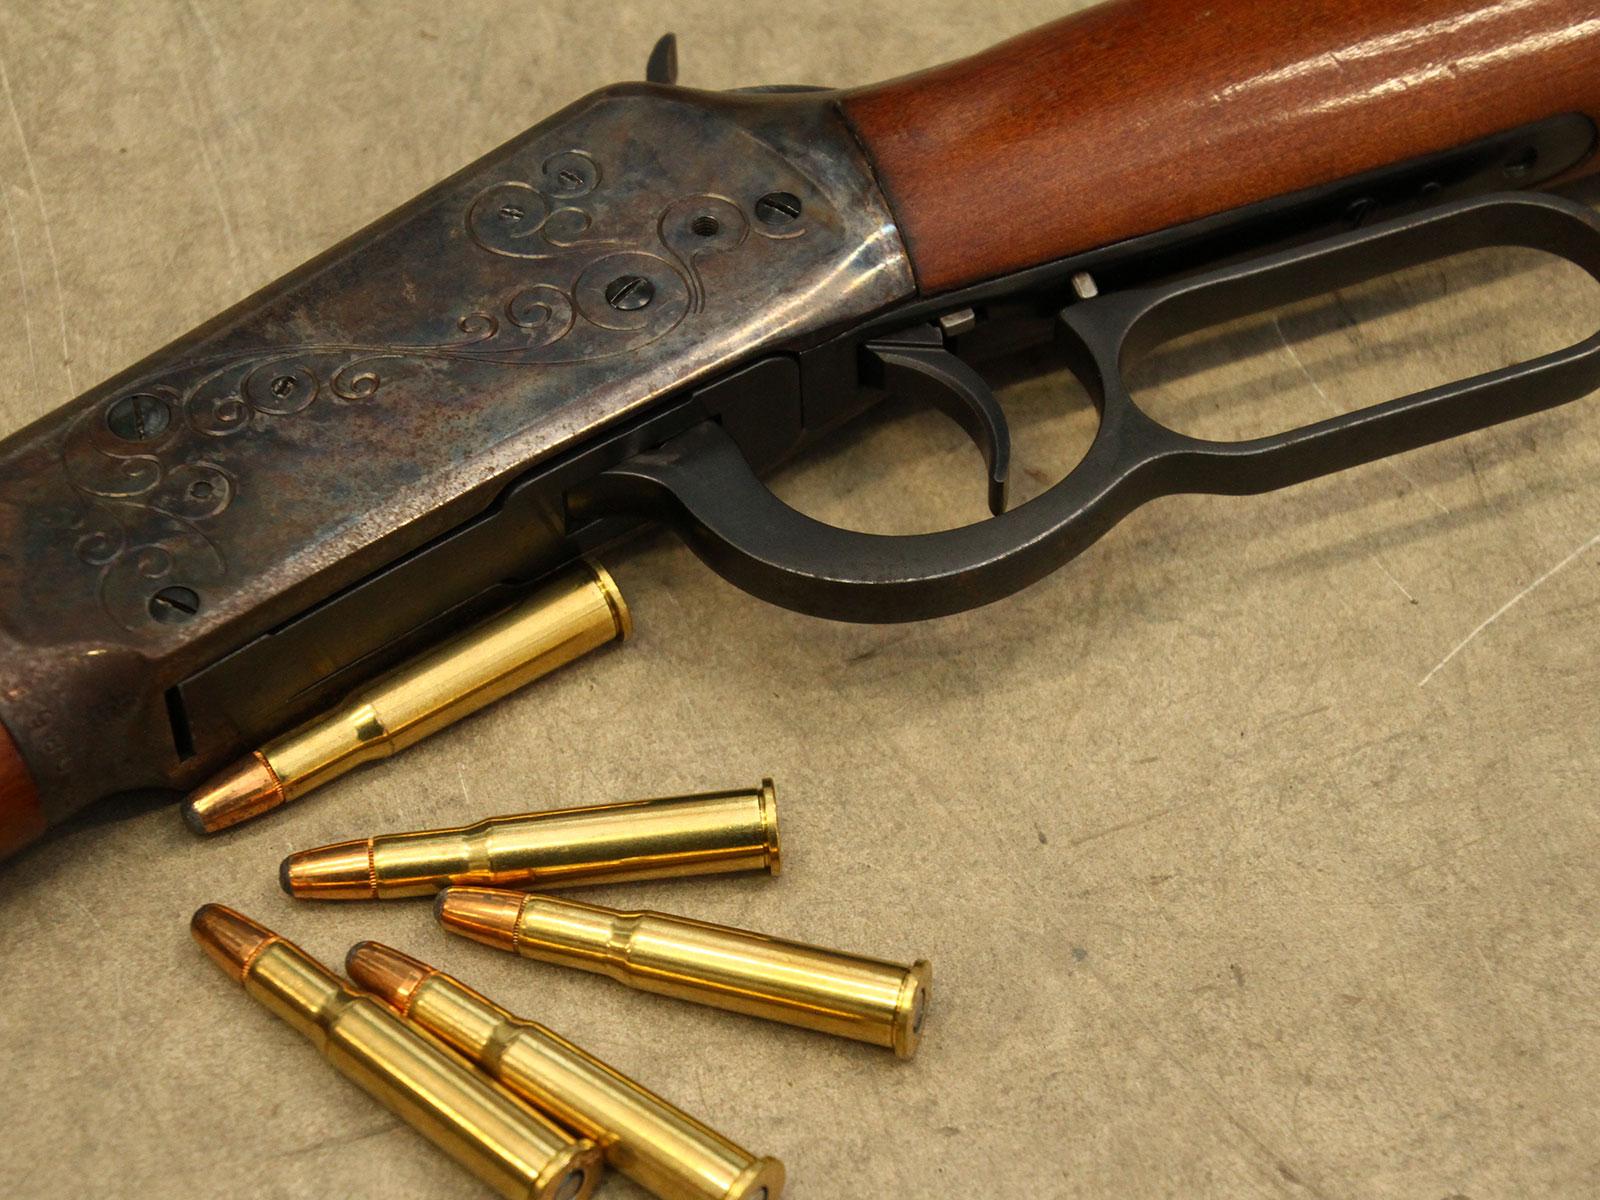 SH_Web_Wir_Waffen_Winchester2_1600x1200